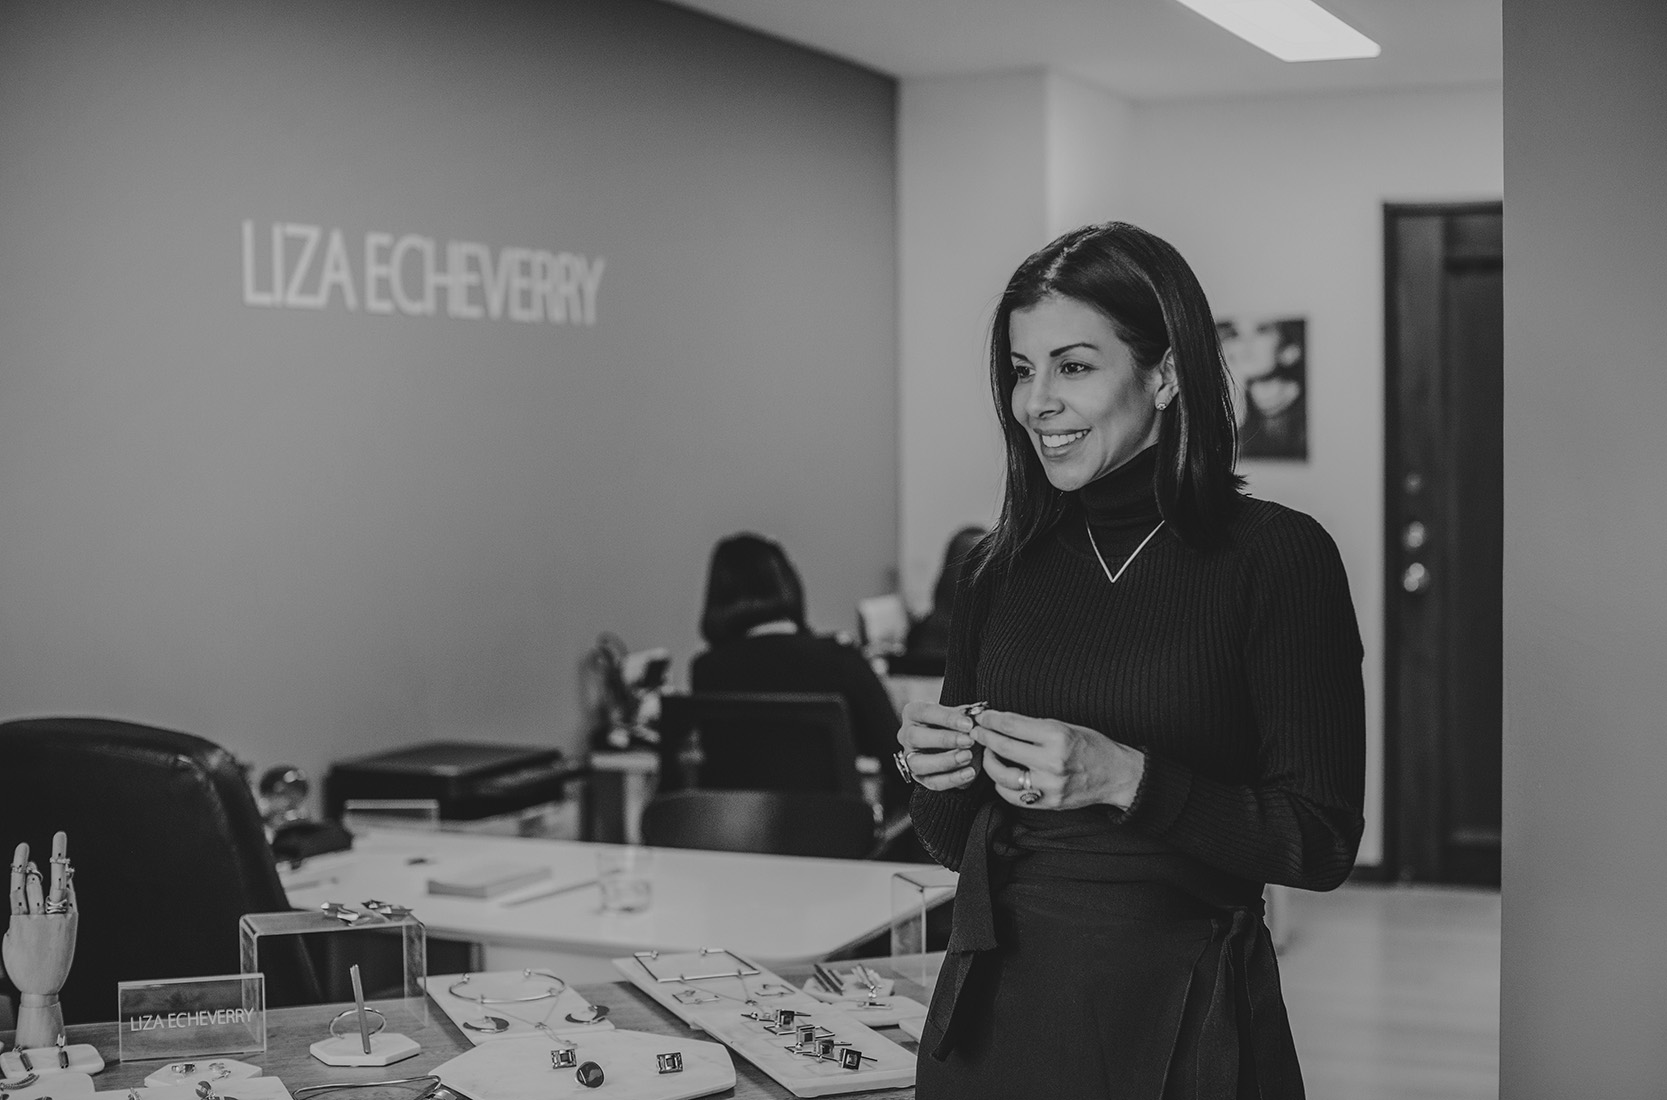 Liza_Echeverry_showroom